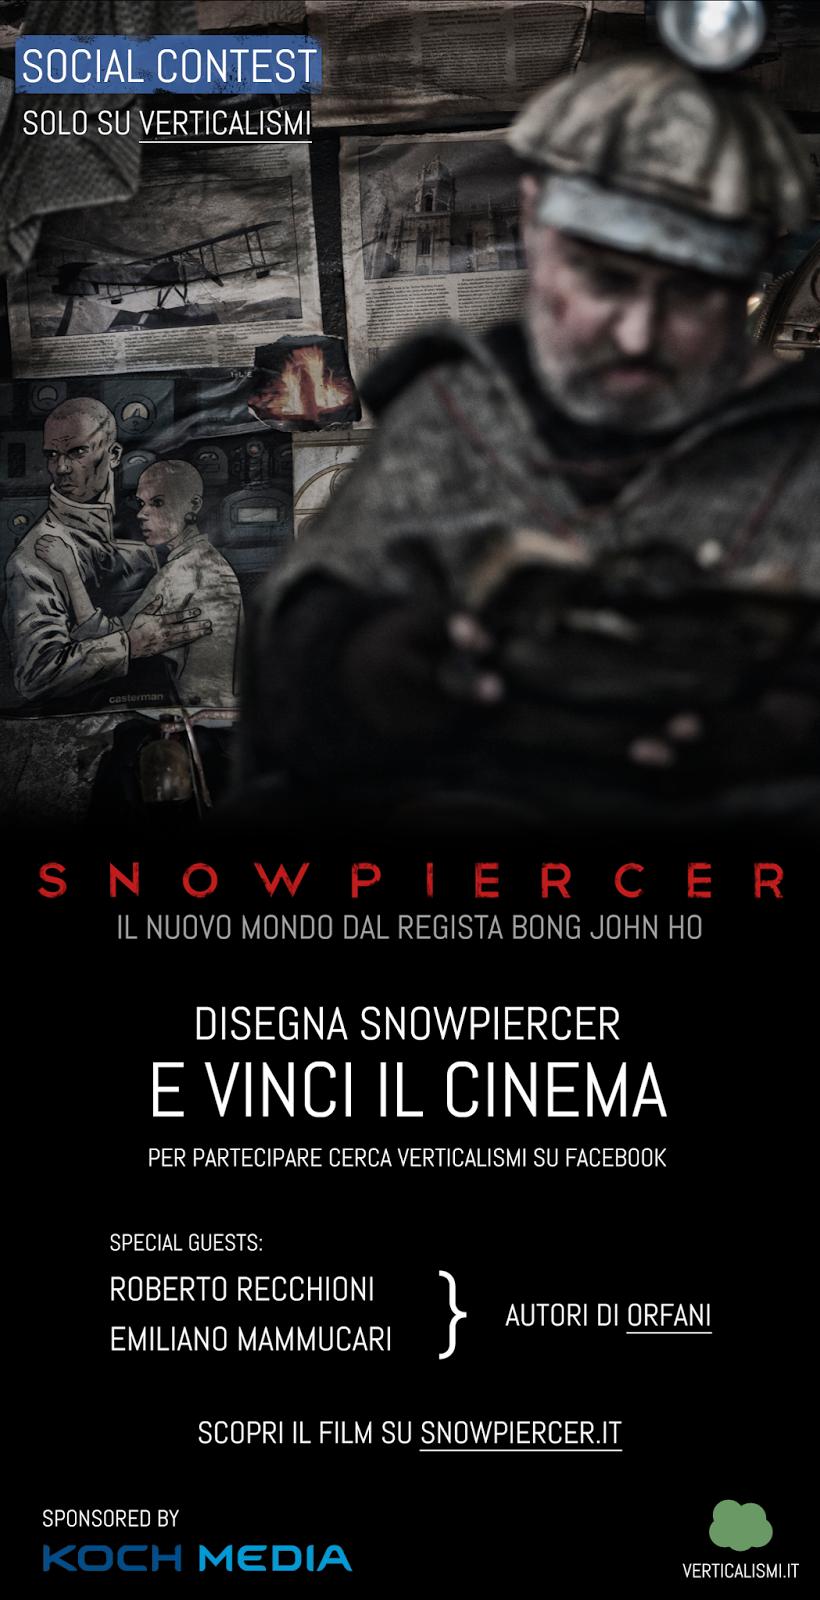 concorso snowpiercer